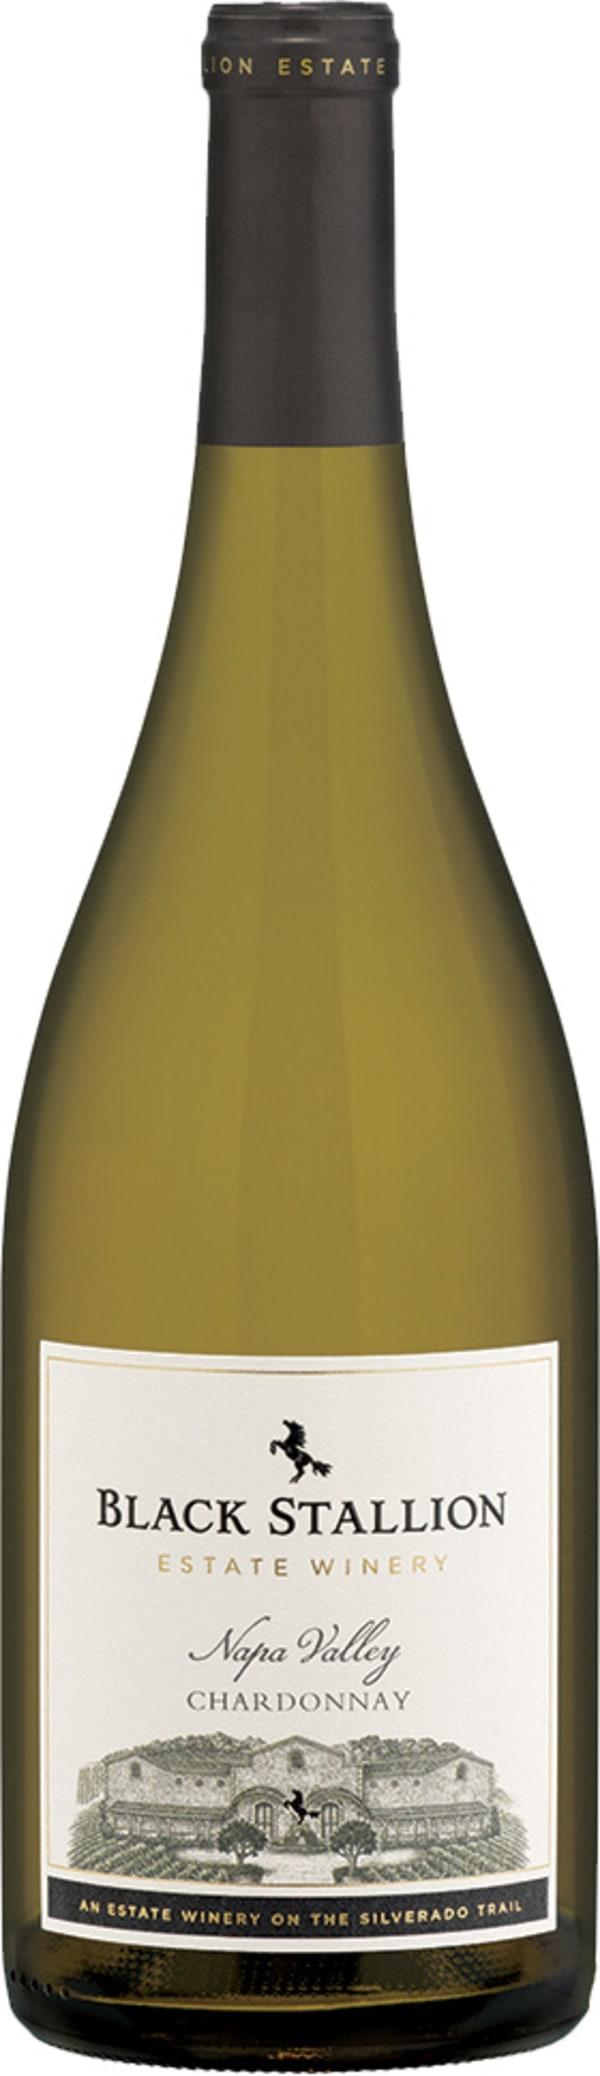 Black Stallion Chardonnay 2015